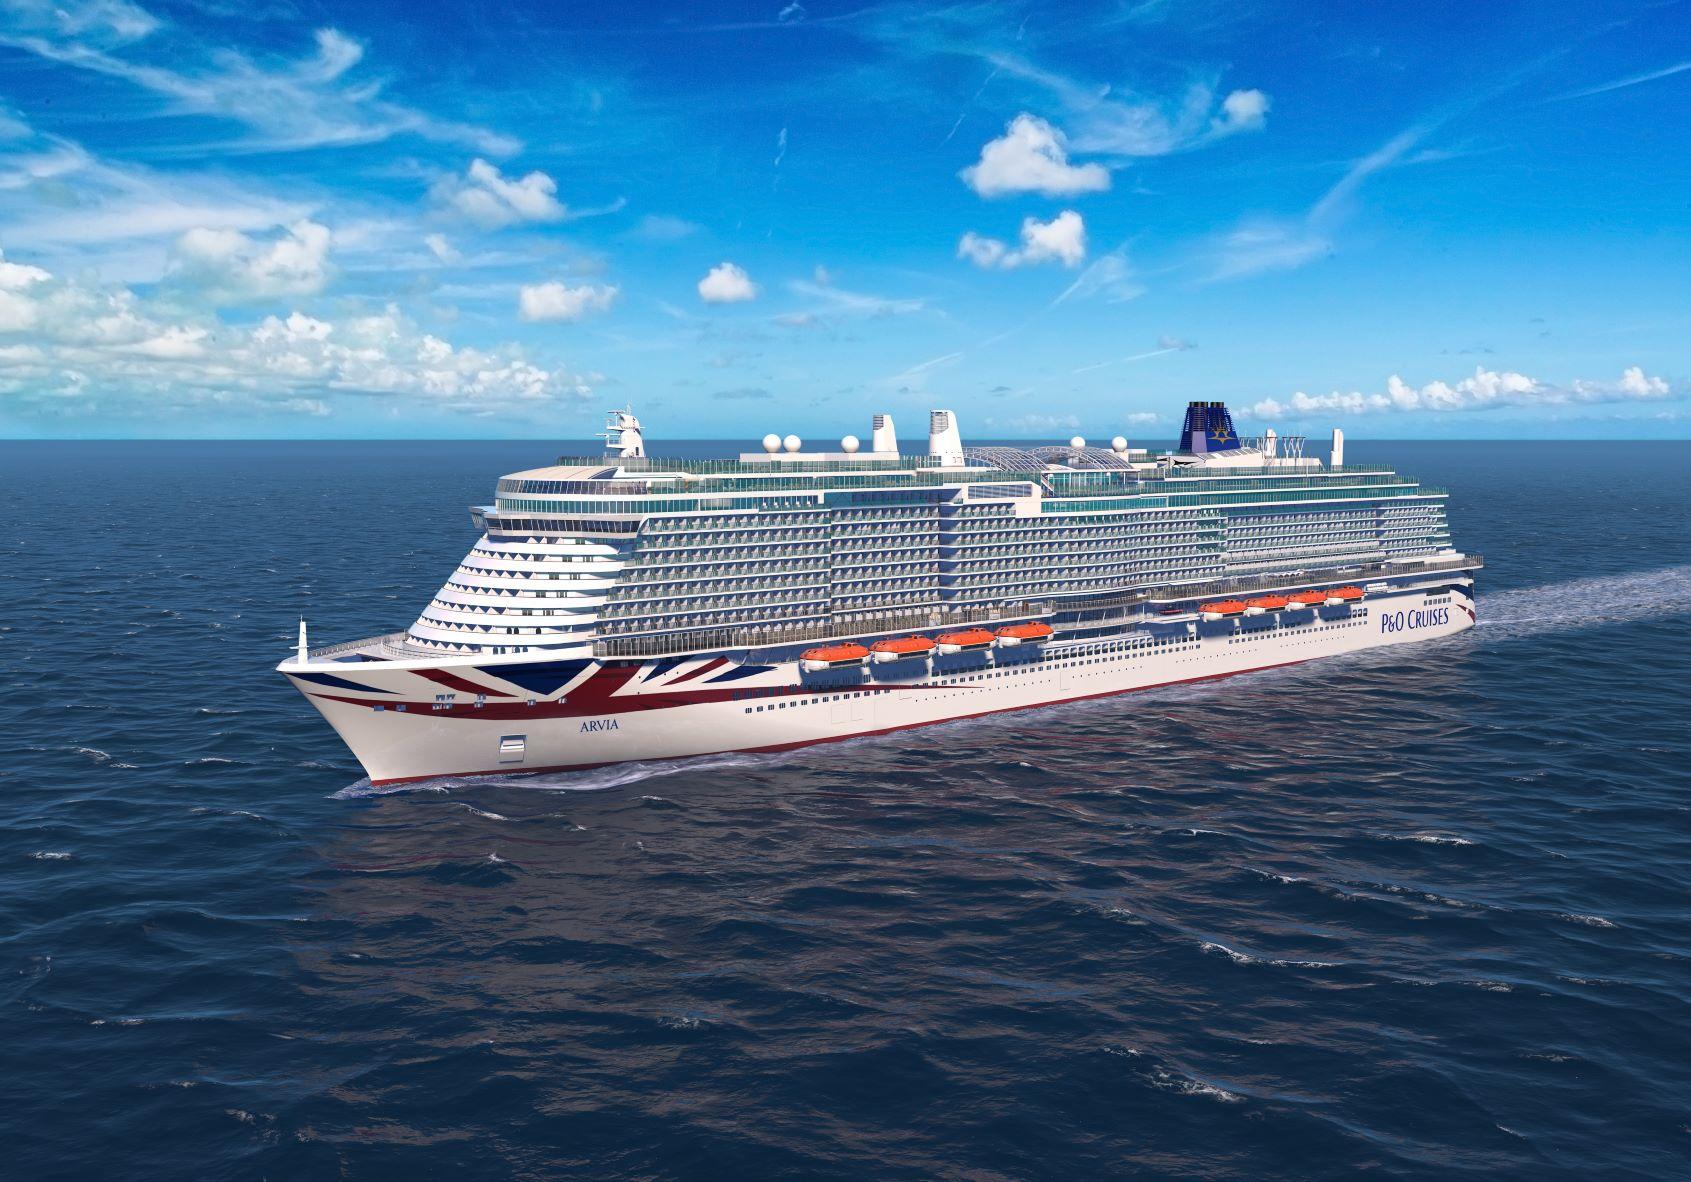 Arvia cruise ship